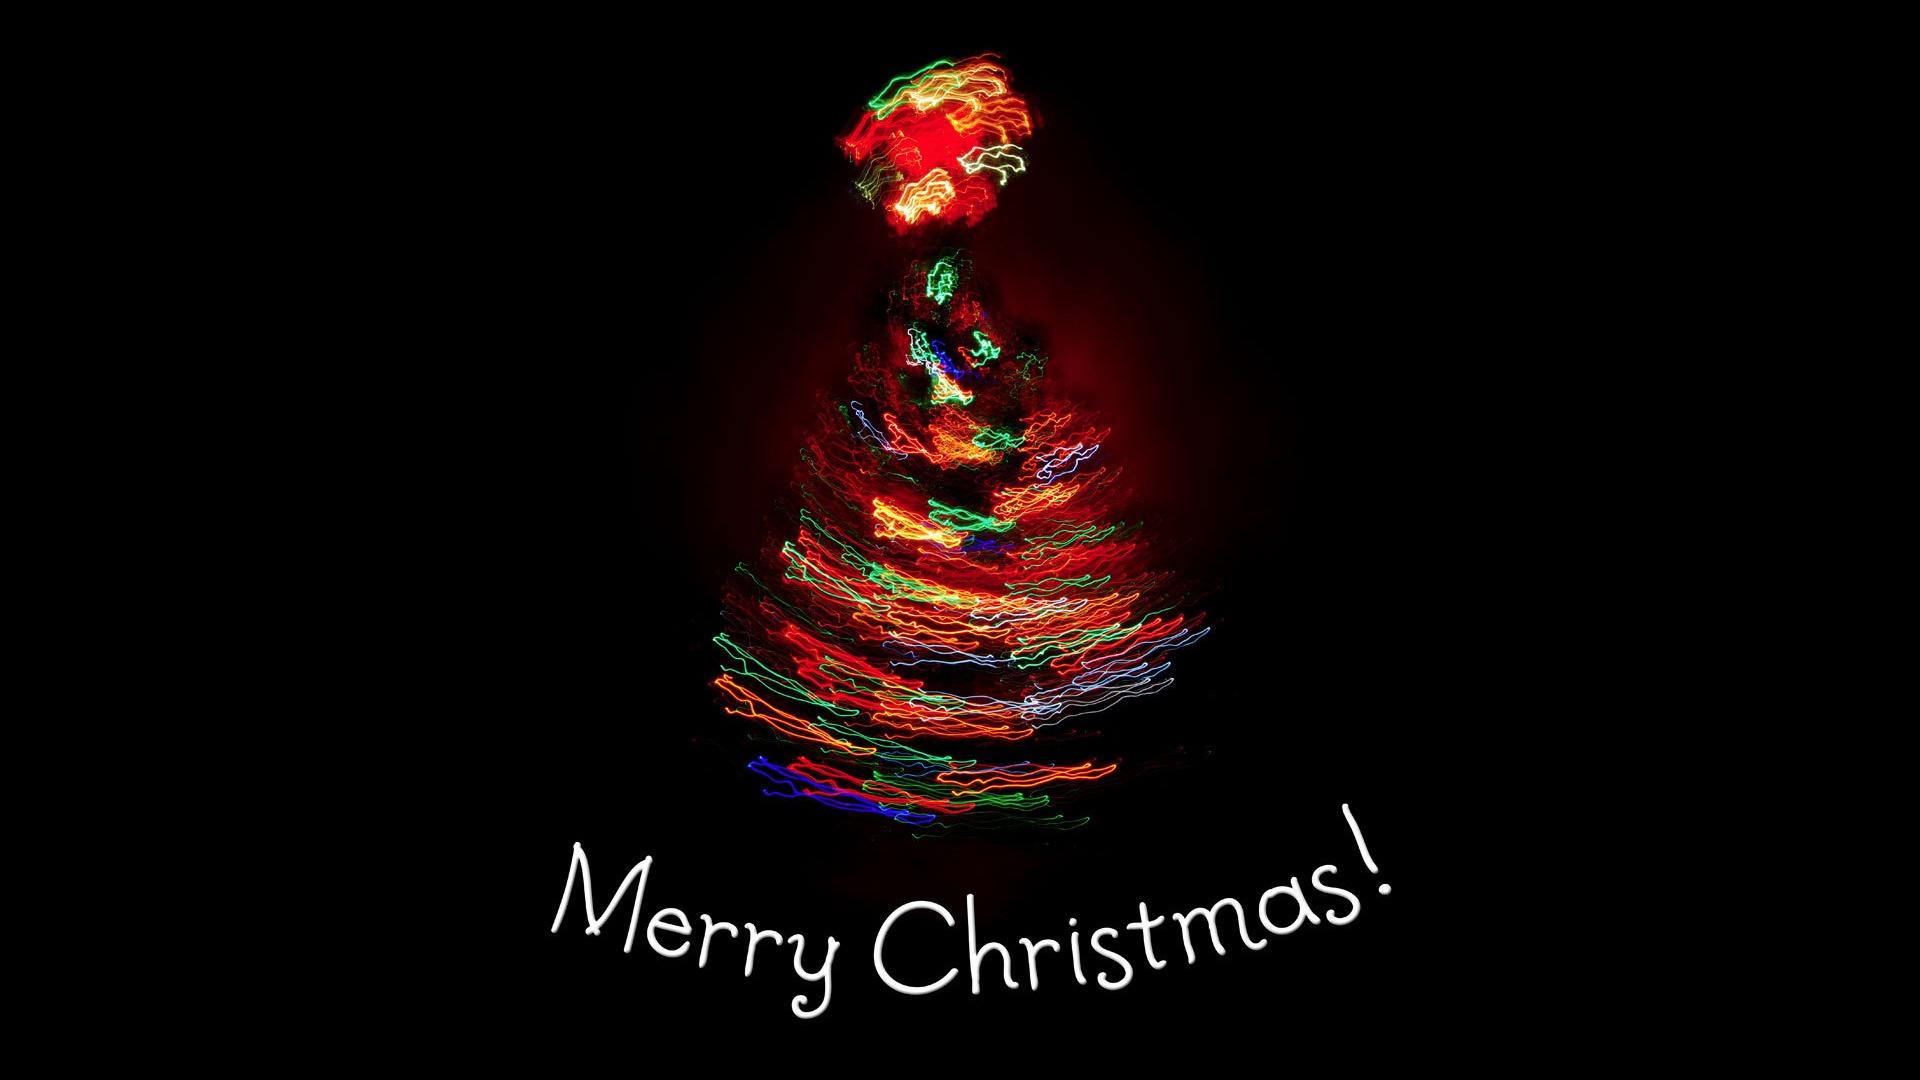 merry christmas wallpapers hd free download   pixelstalk